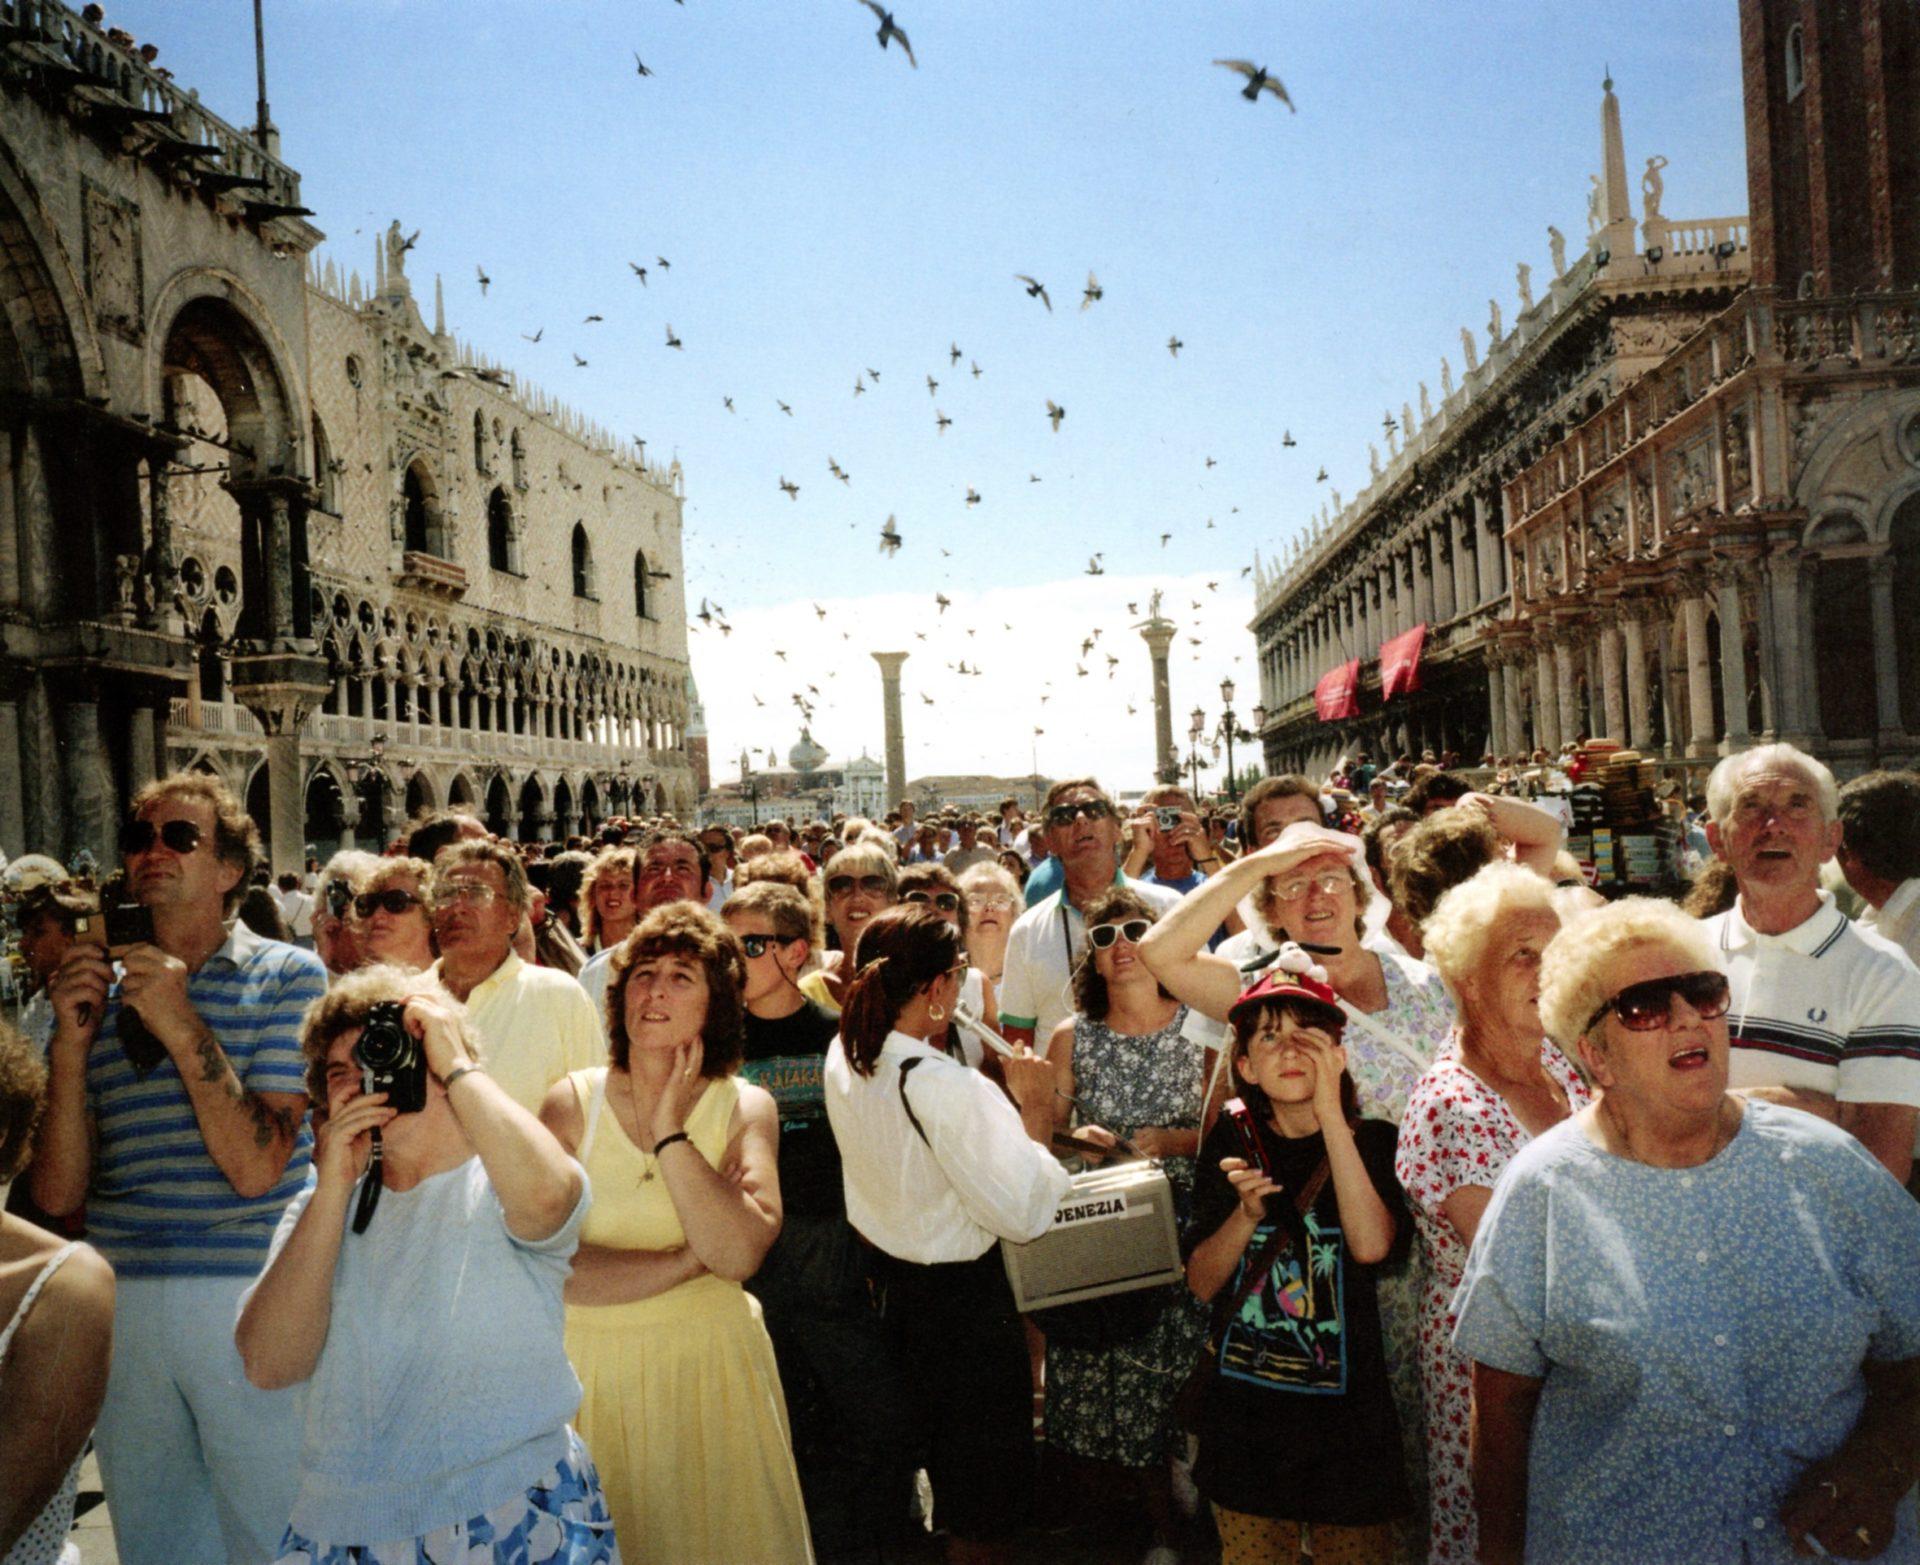 Martin Parr Venezia 1989 OK - Milano Photofestival